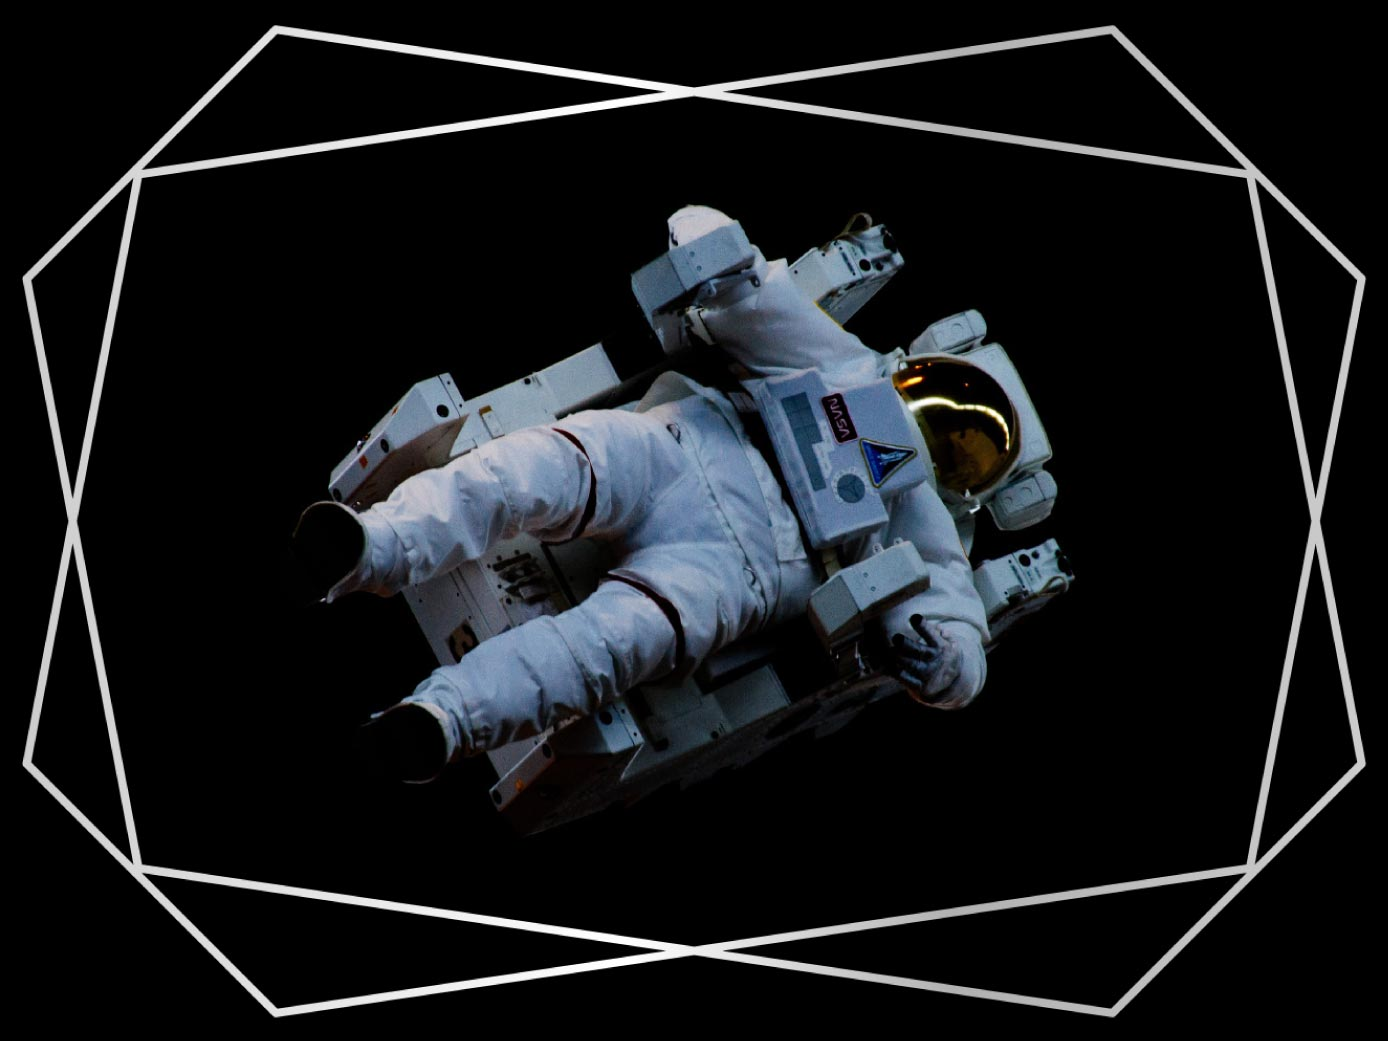 Silver geometric frame for Mac in ImageFramer